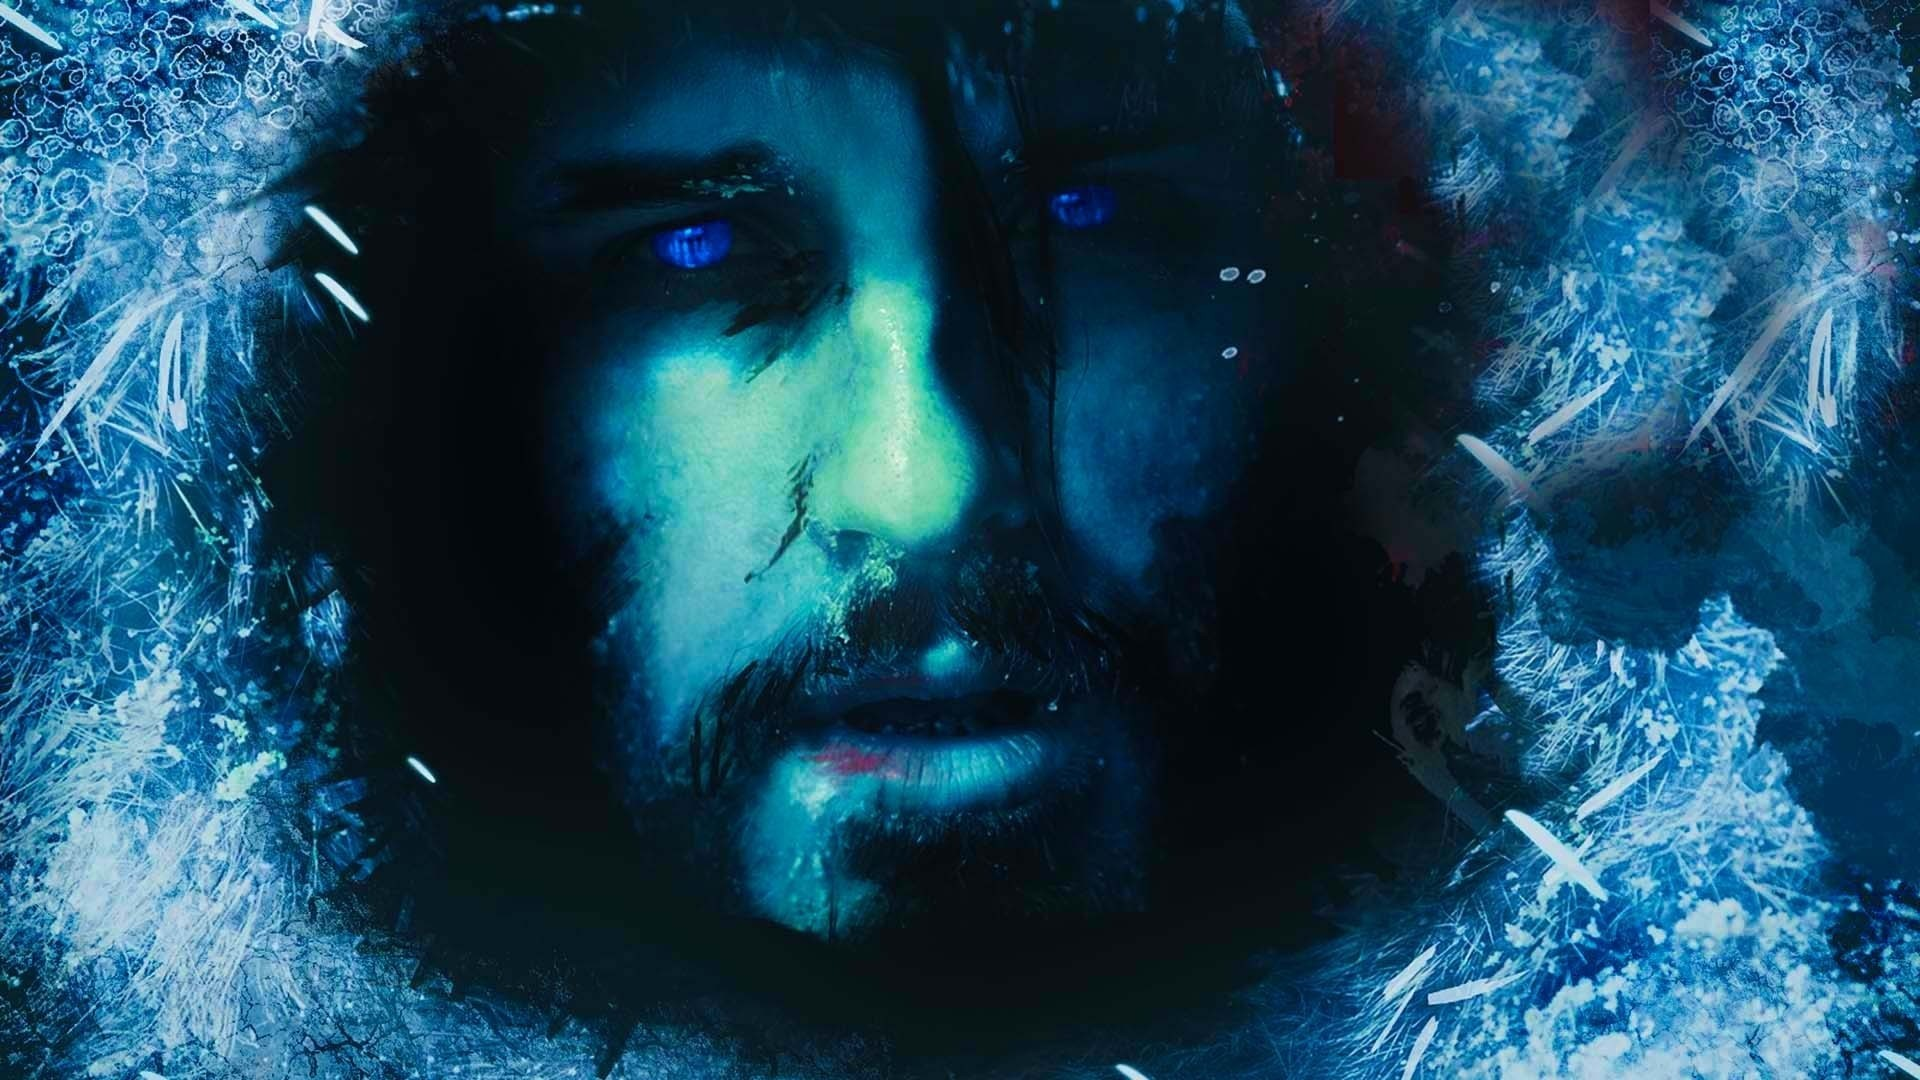 Full HD Wallpaper 30 days of night horror art frost blue .